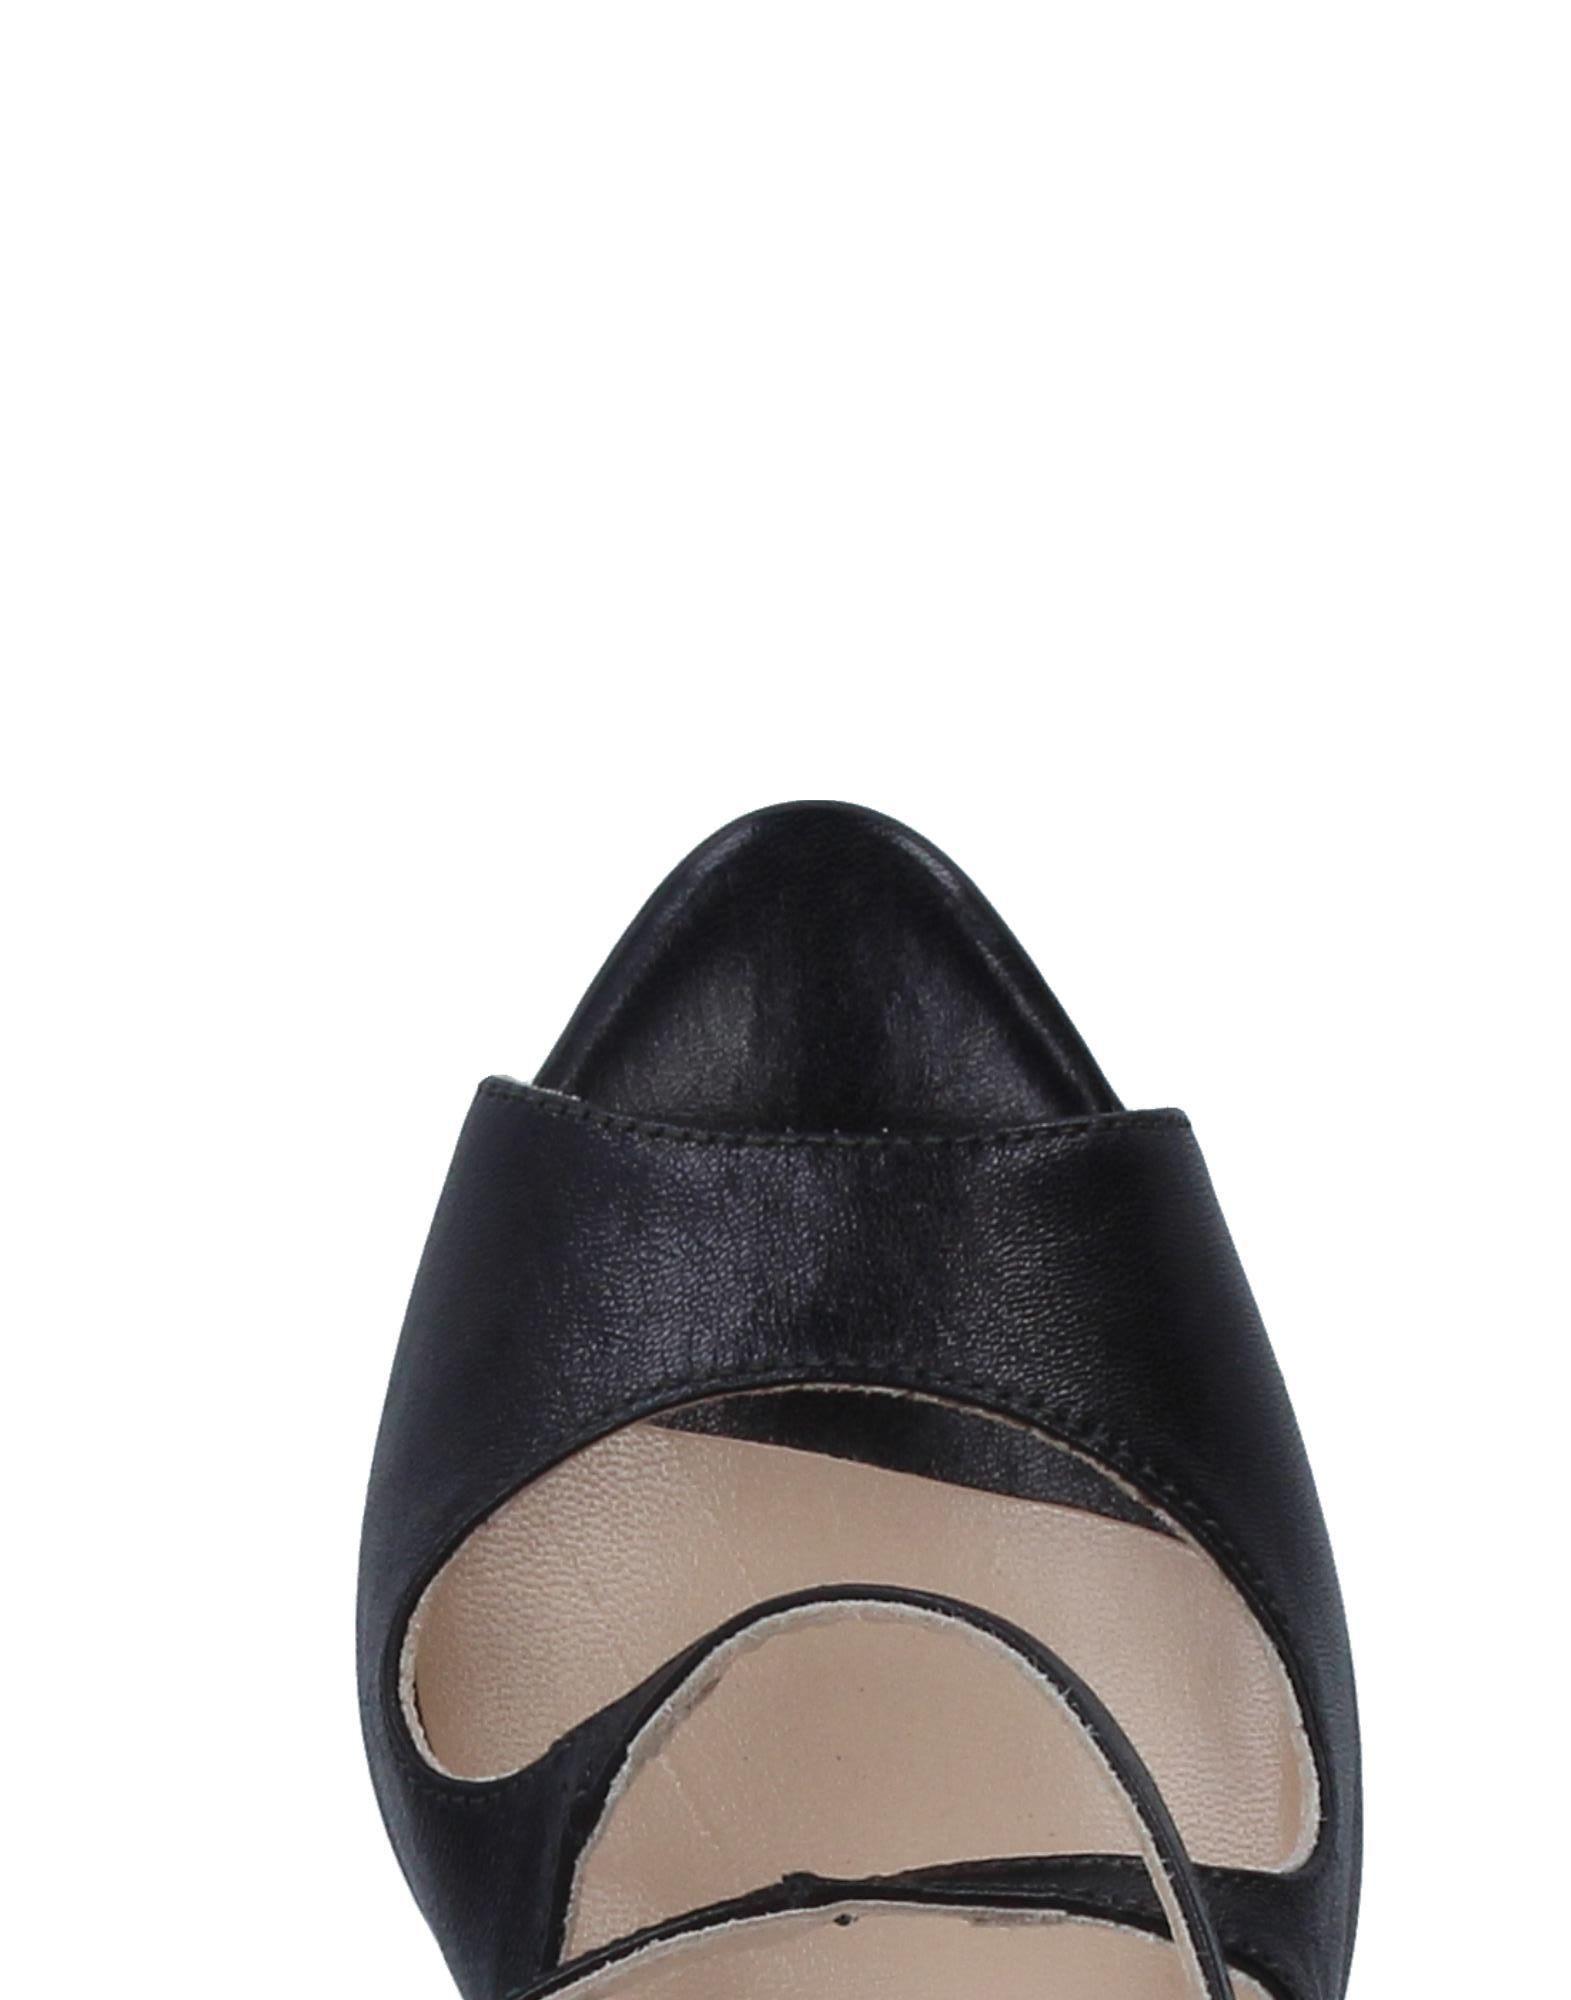 Sandales #Reset Femme - Sandales #Reset sur